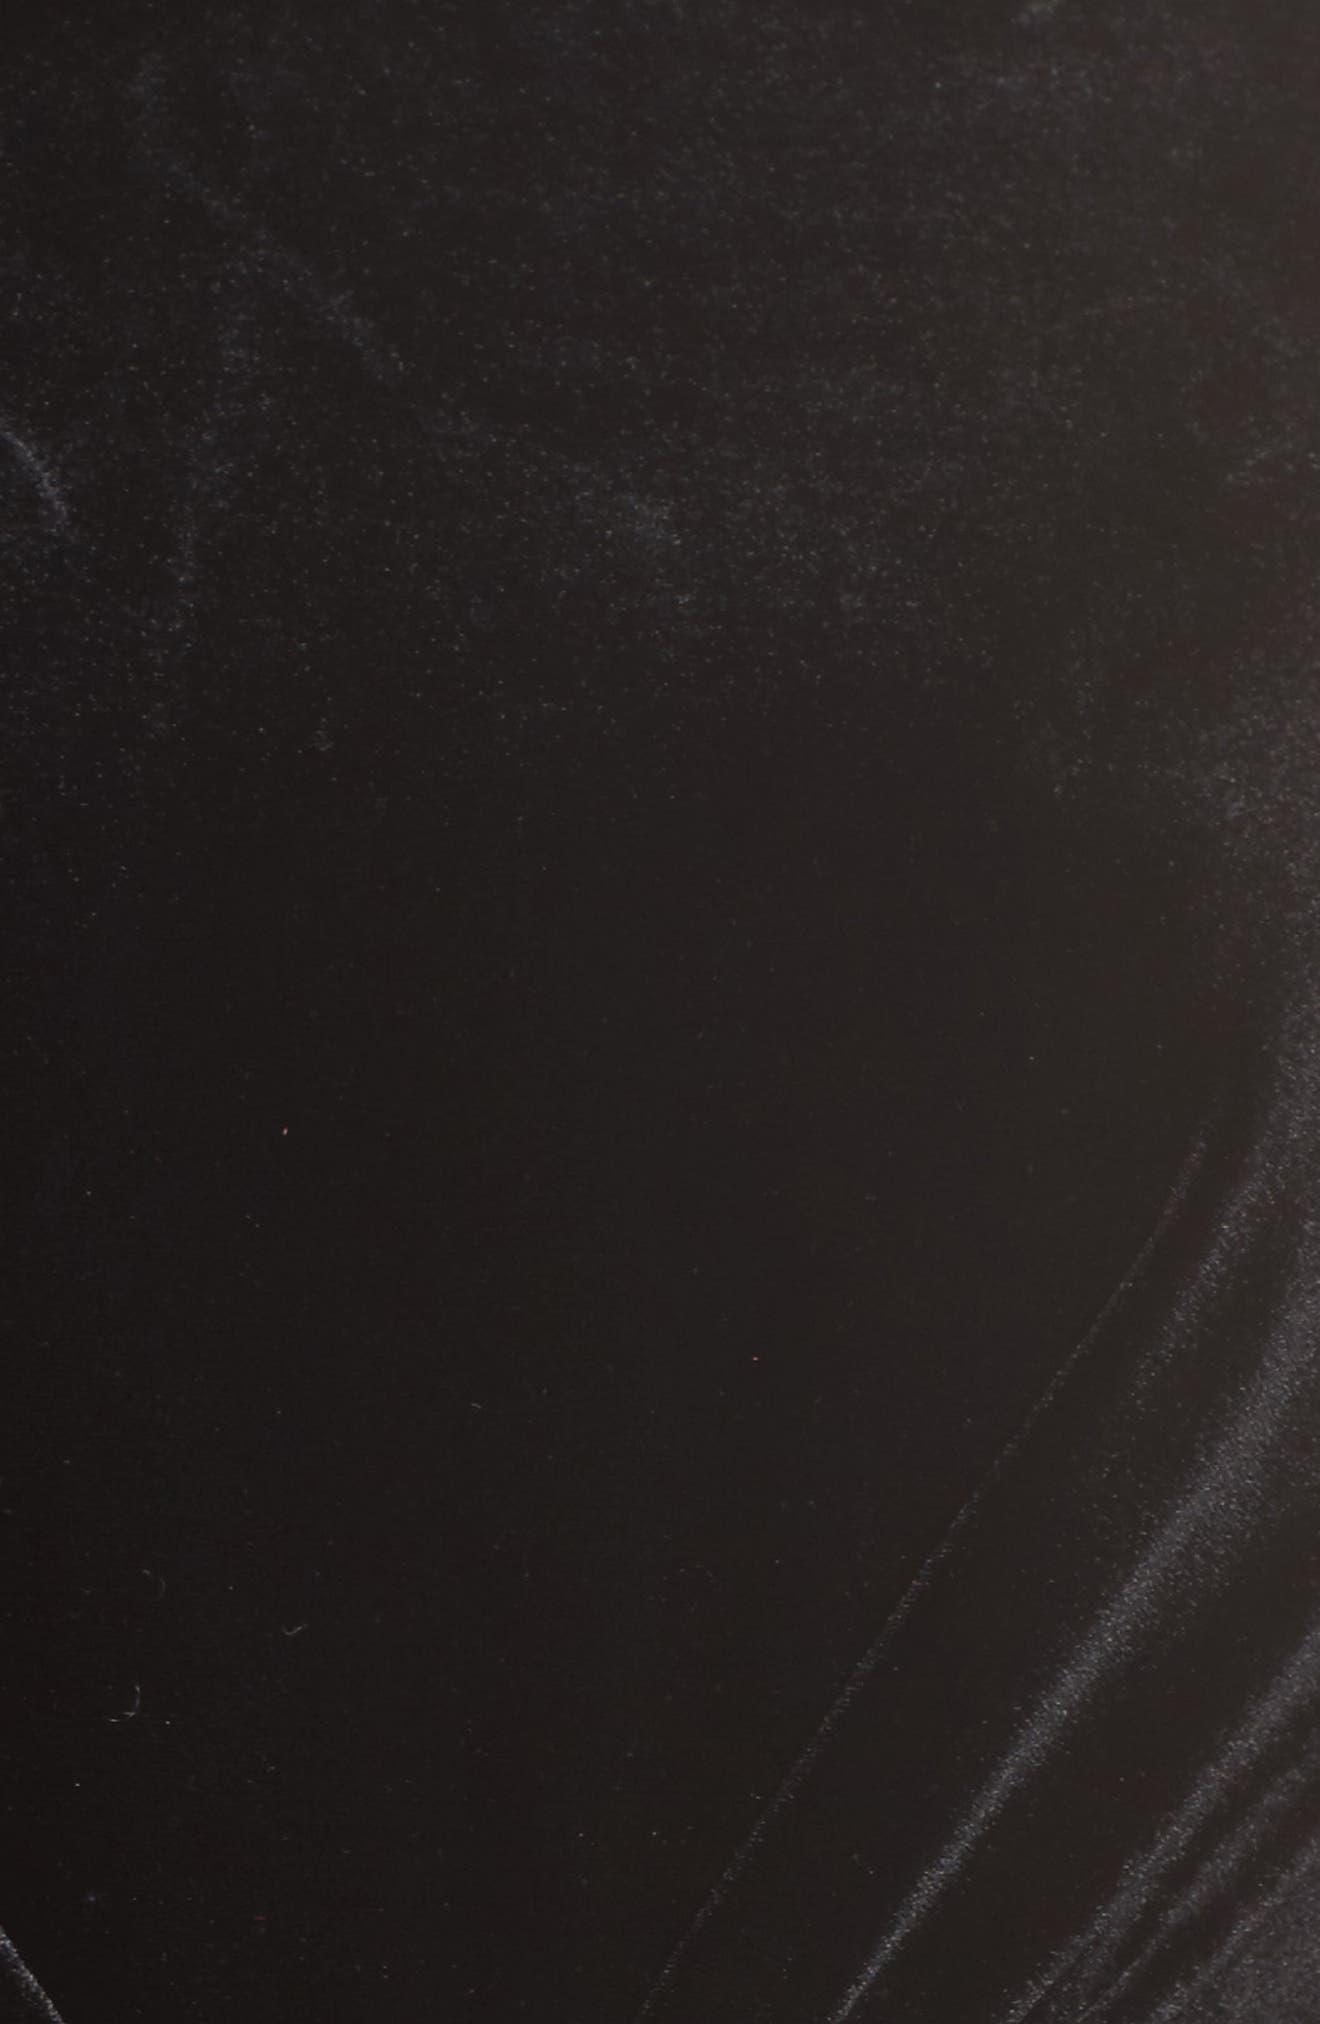 Reach Out Velvet Maxi Dress,                             Alternate thumbnail 5, color,                             001